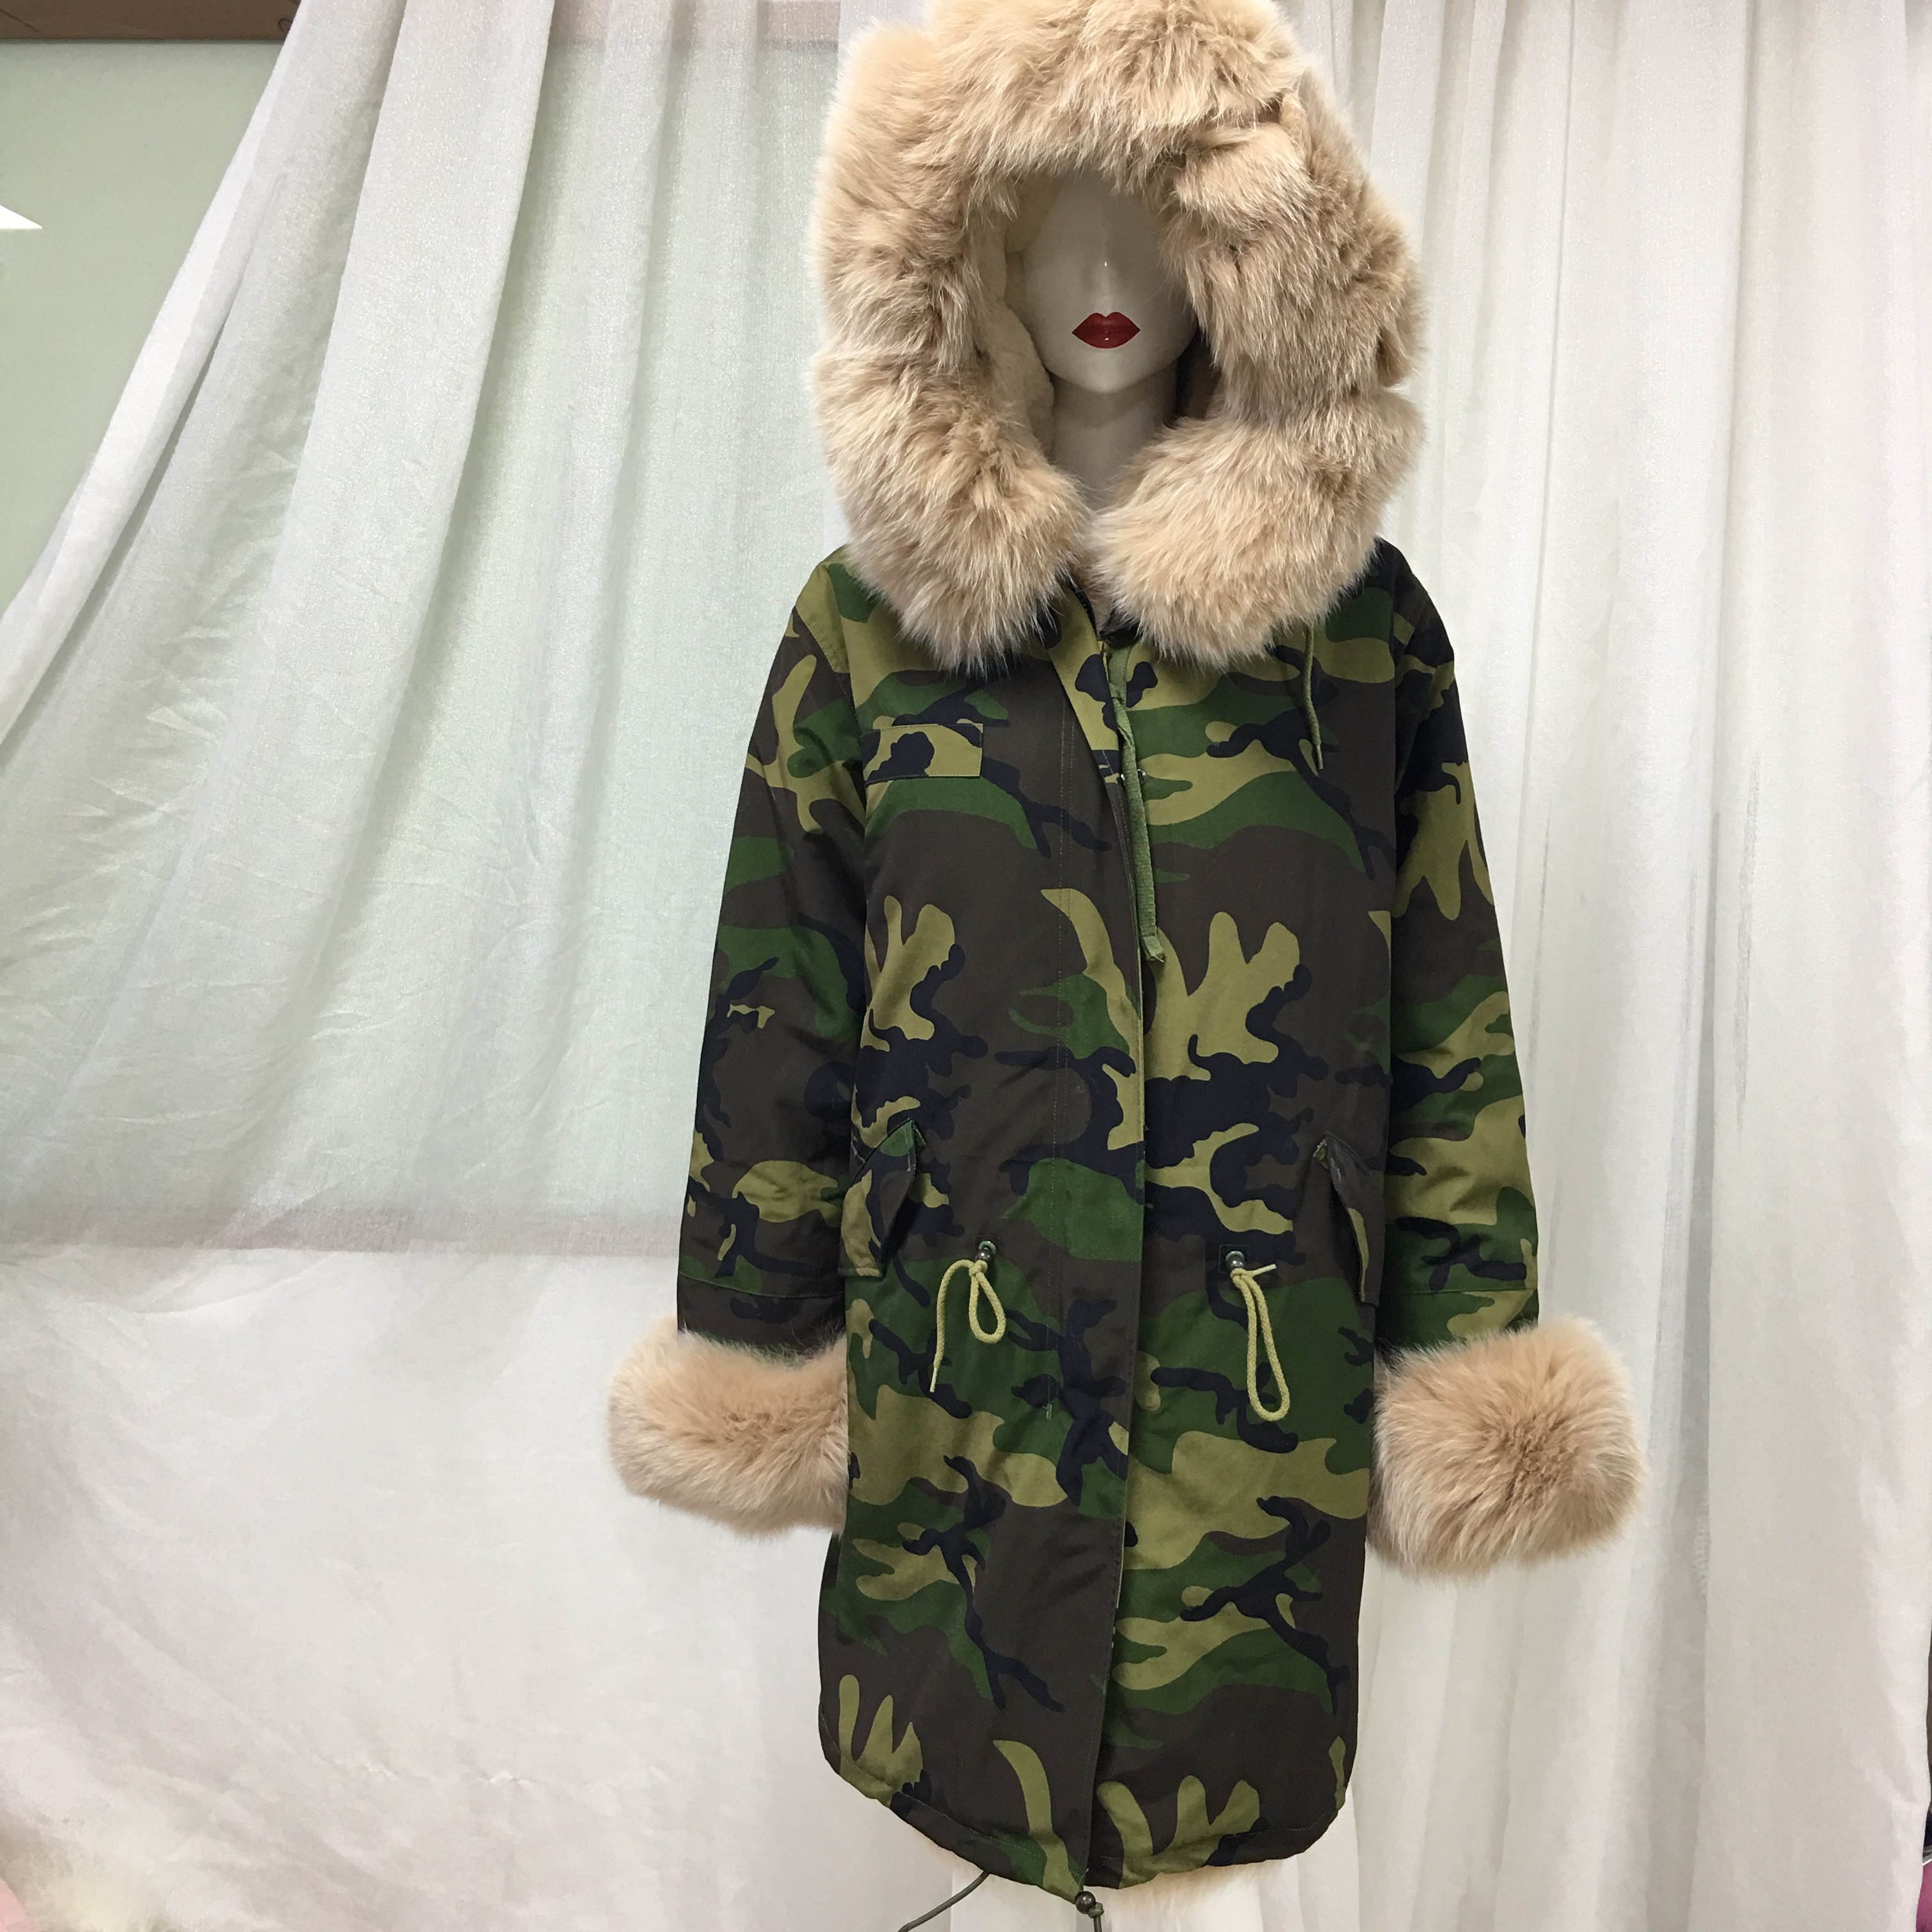 Latest Pretty Leisure Casual Women Apricot Real Tartan Fox Fur Front Cuff Collar Long Camouflage Winter Jacket